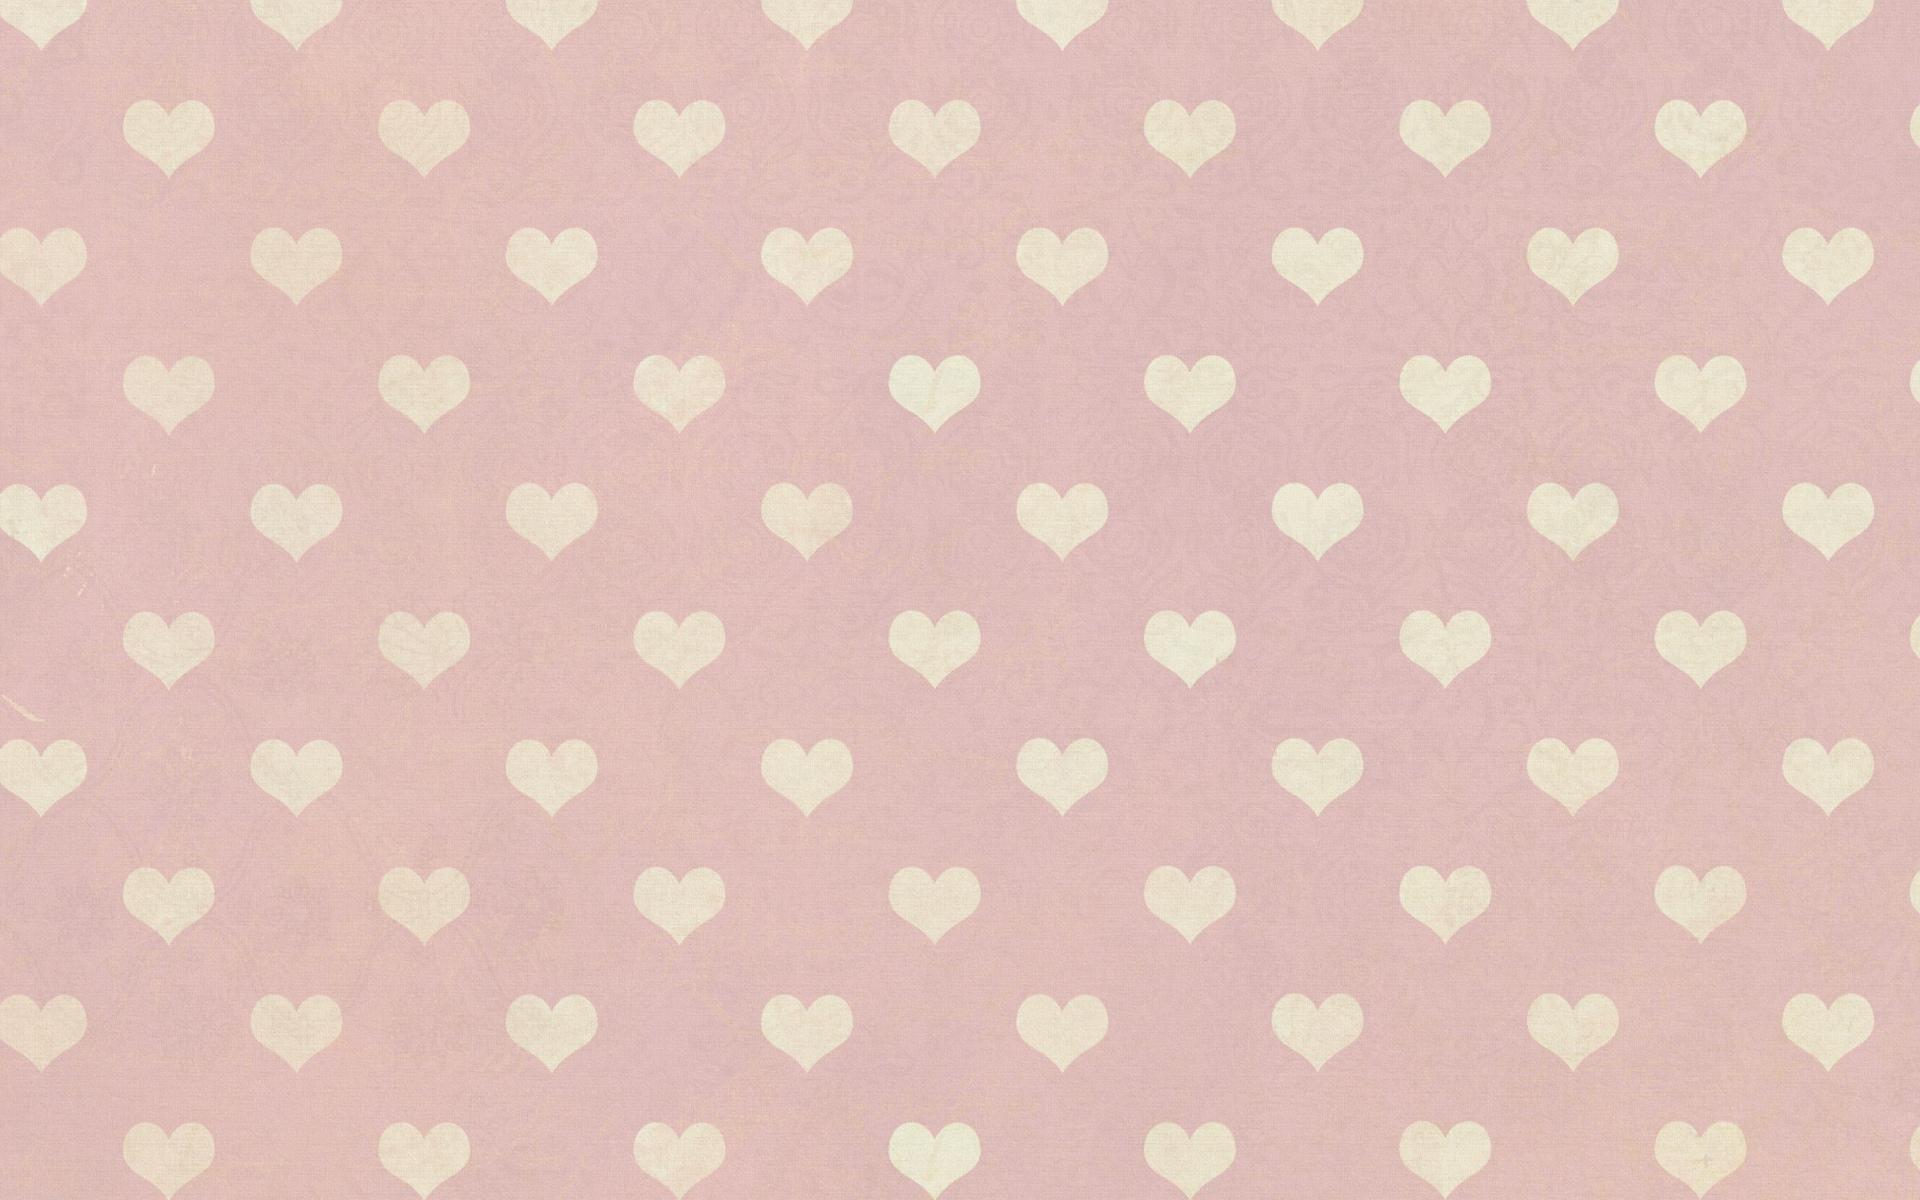 Free Heart Pattern Wallpaper 41521 1920x1200 Px